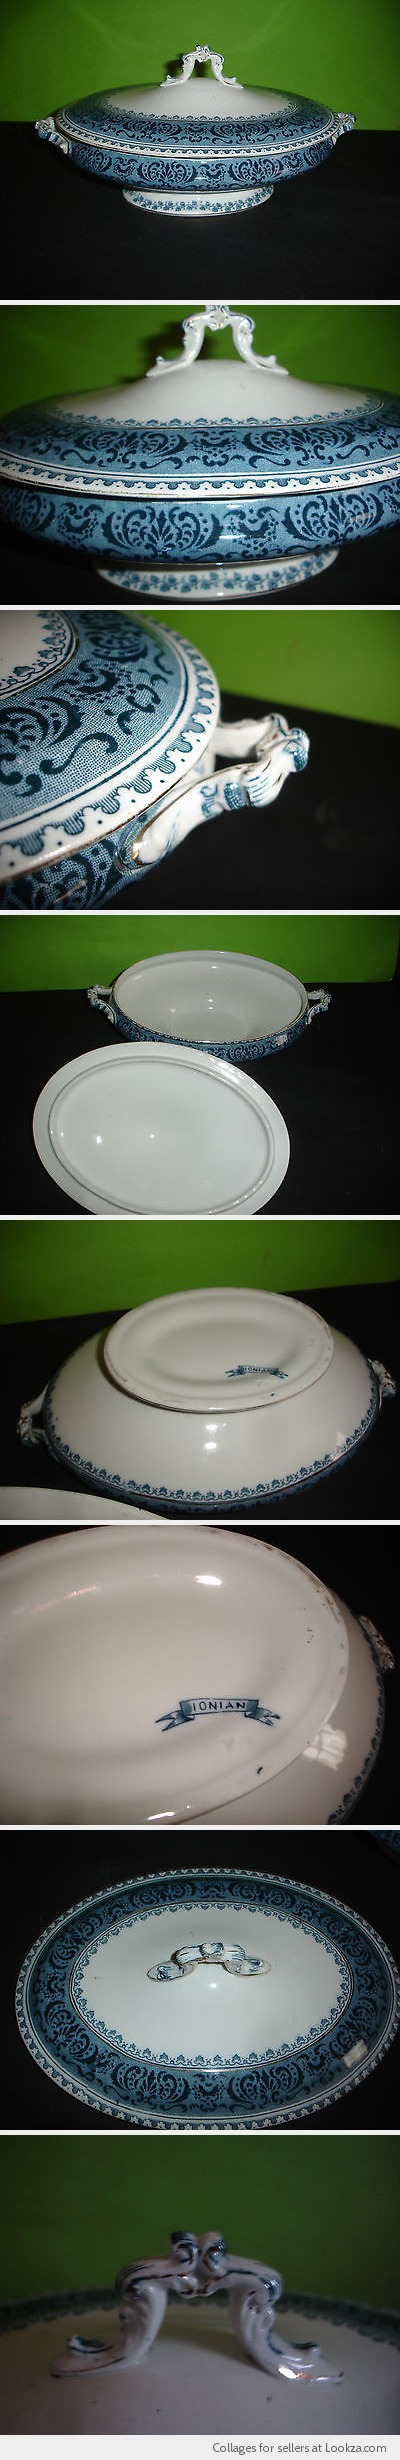 ANTIQUE VICTORIAN VEGETABLE SOUP TUREEN FLOW BLUE WHITE PORCELAIN RAISED BASE NR - Found on Lookza.com